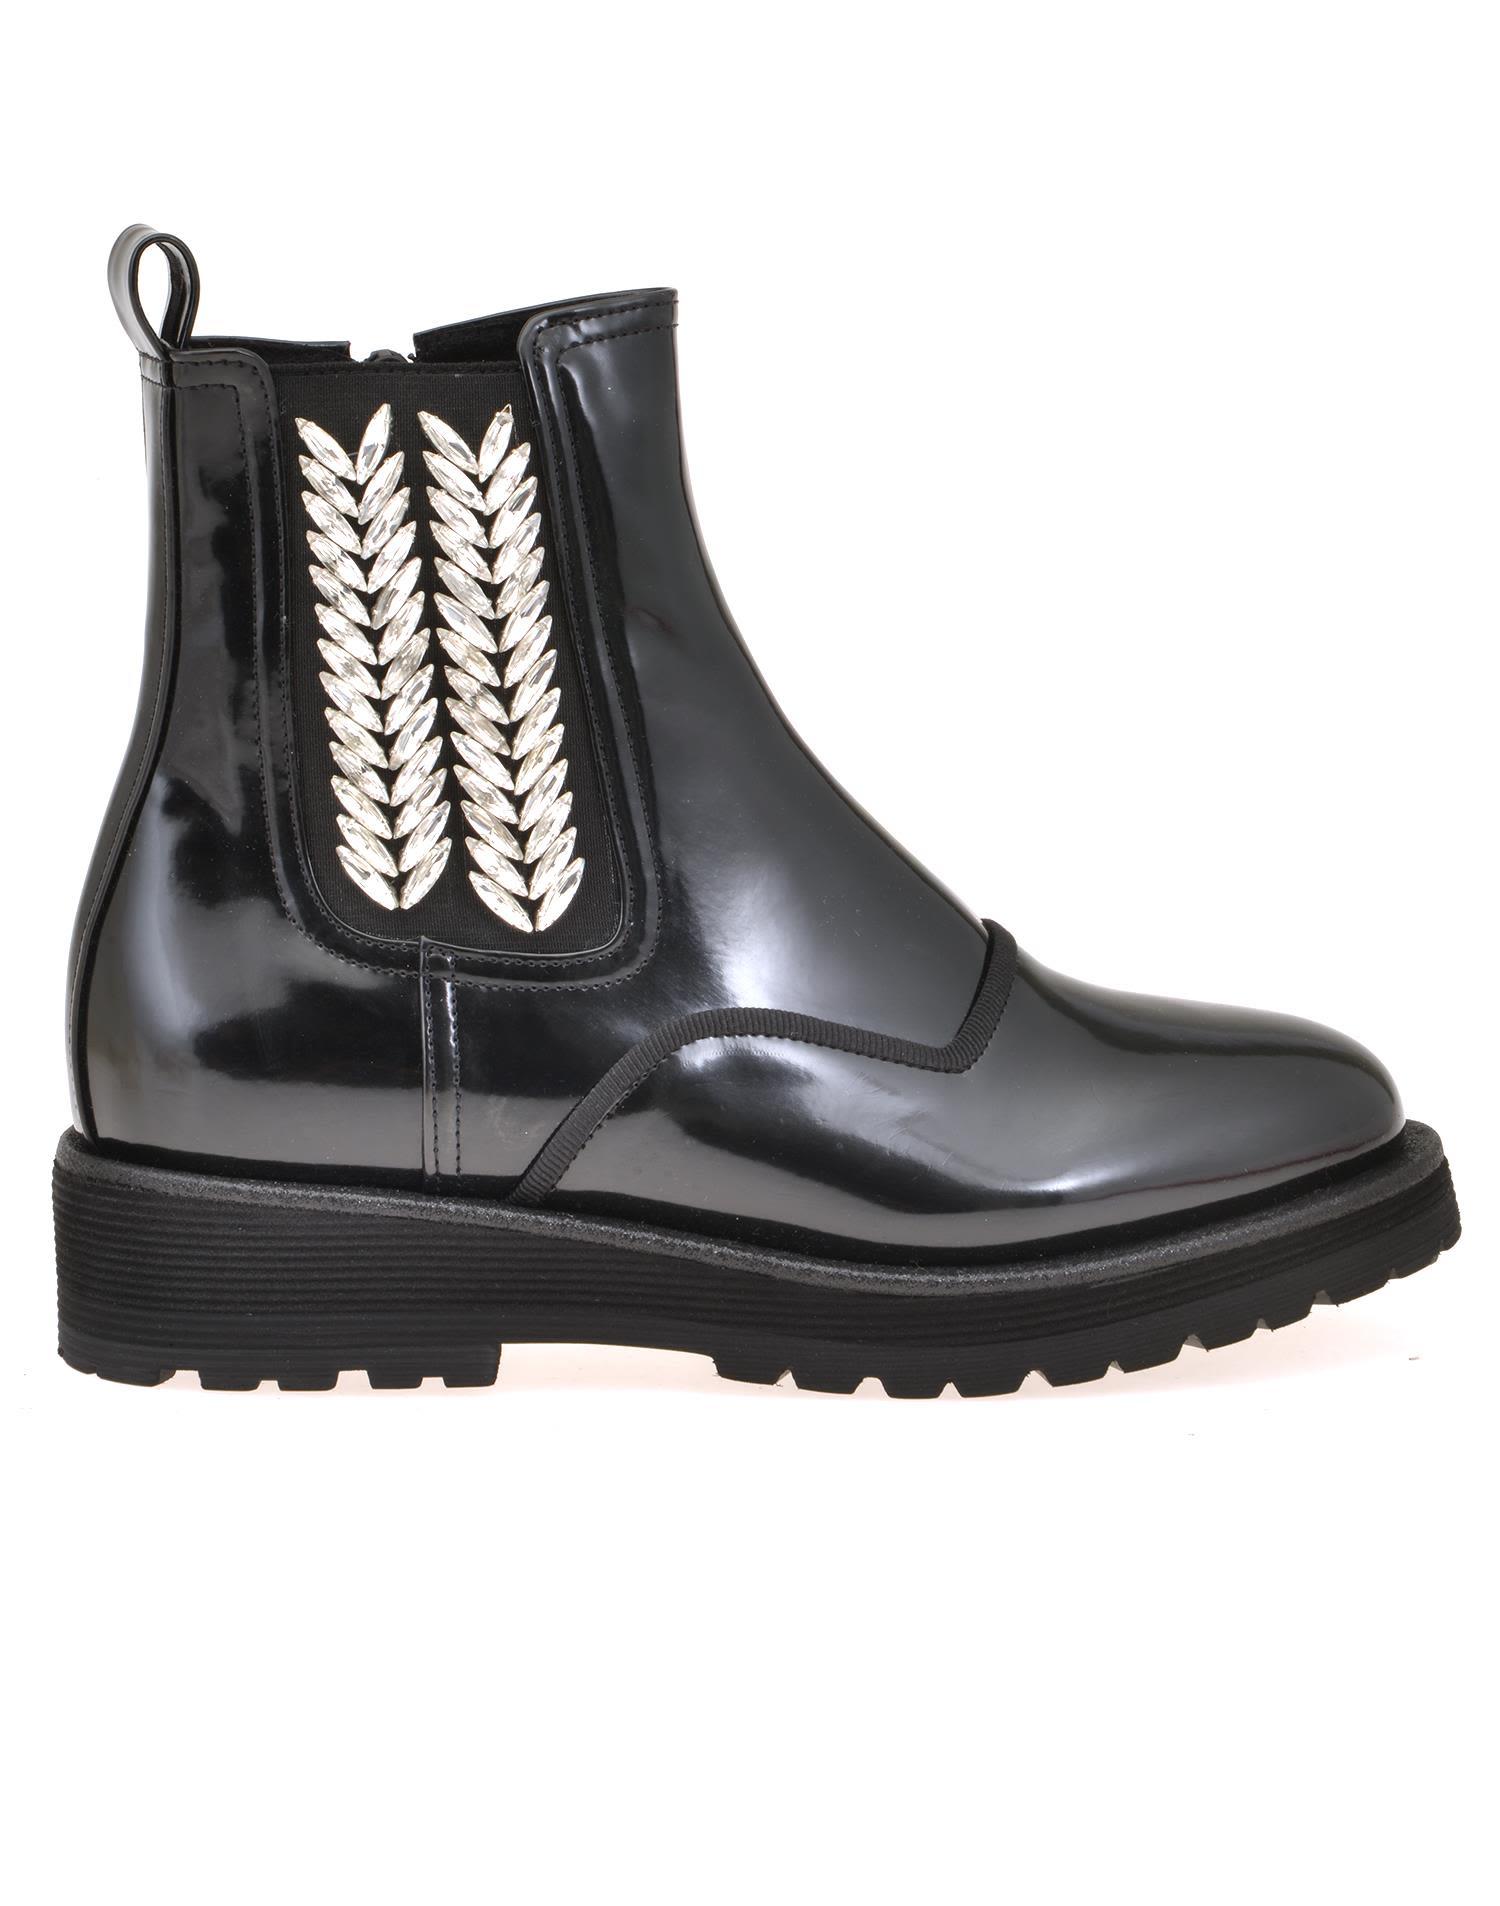 Suecomma Bonnie Leather Chelsea Boot